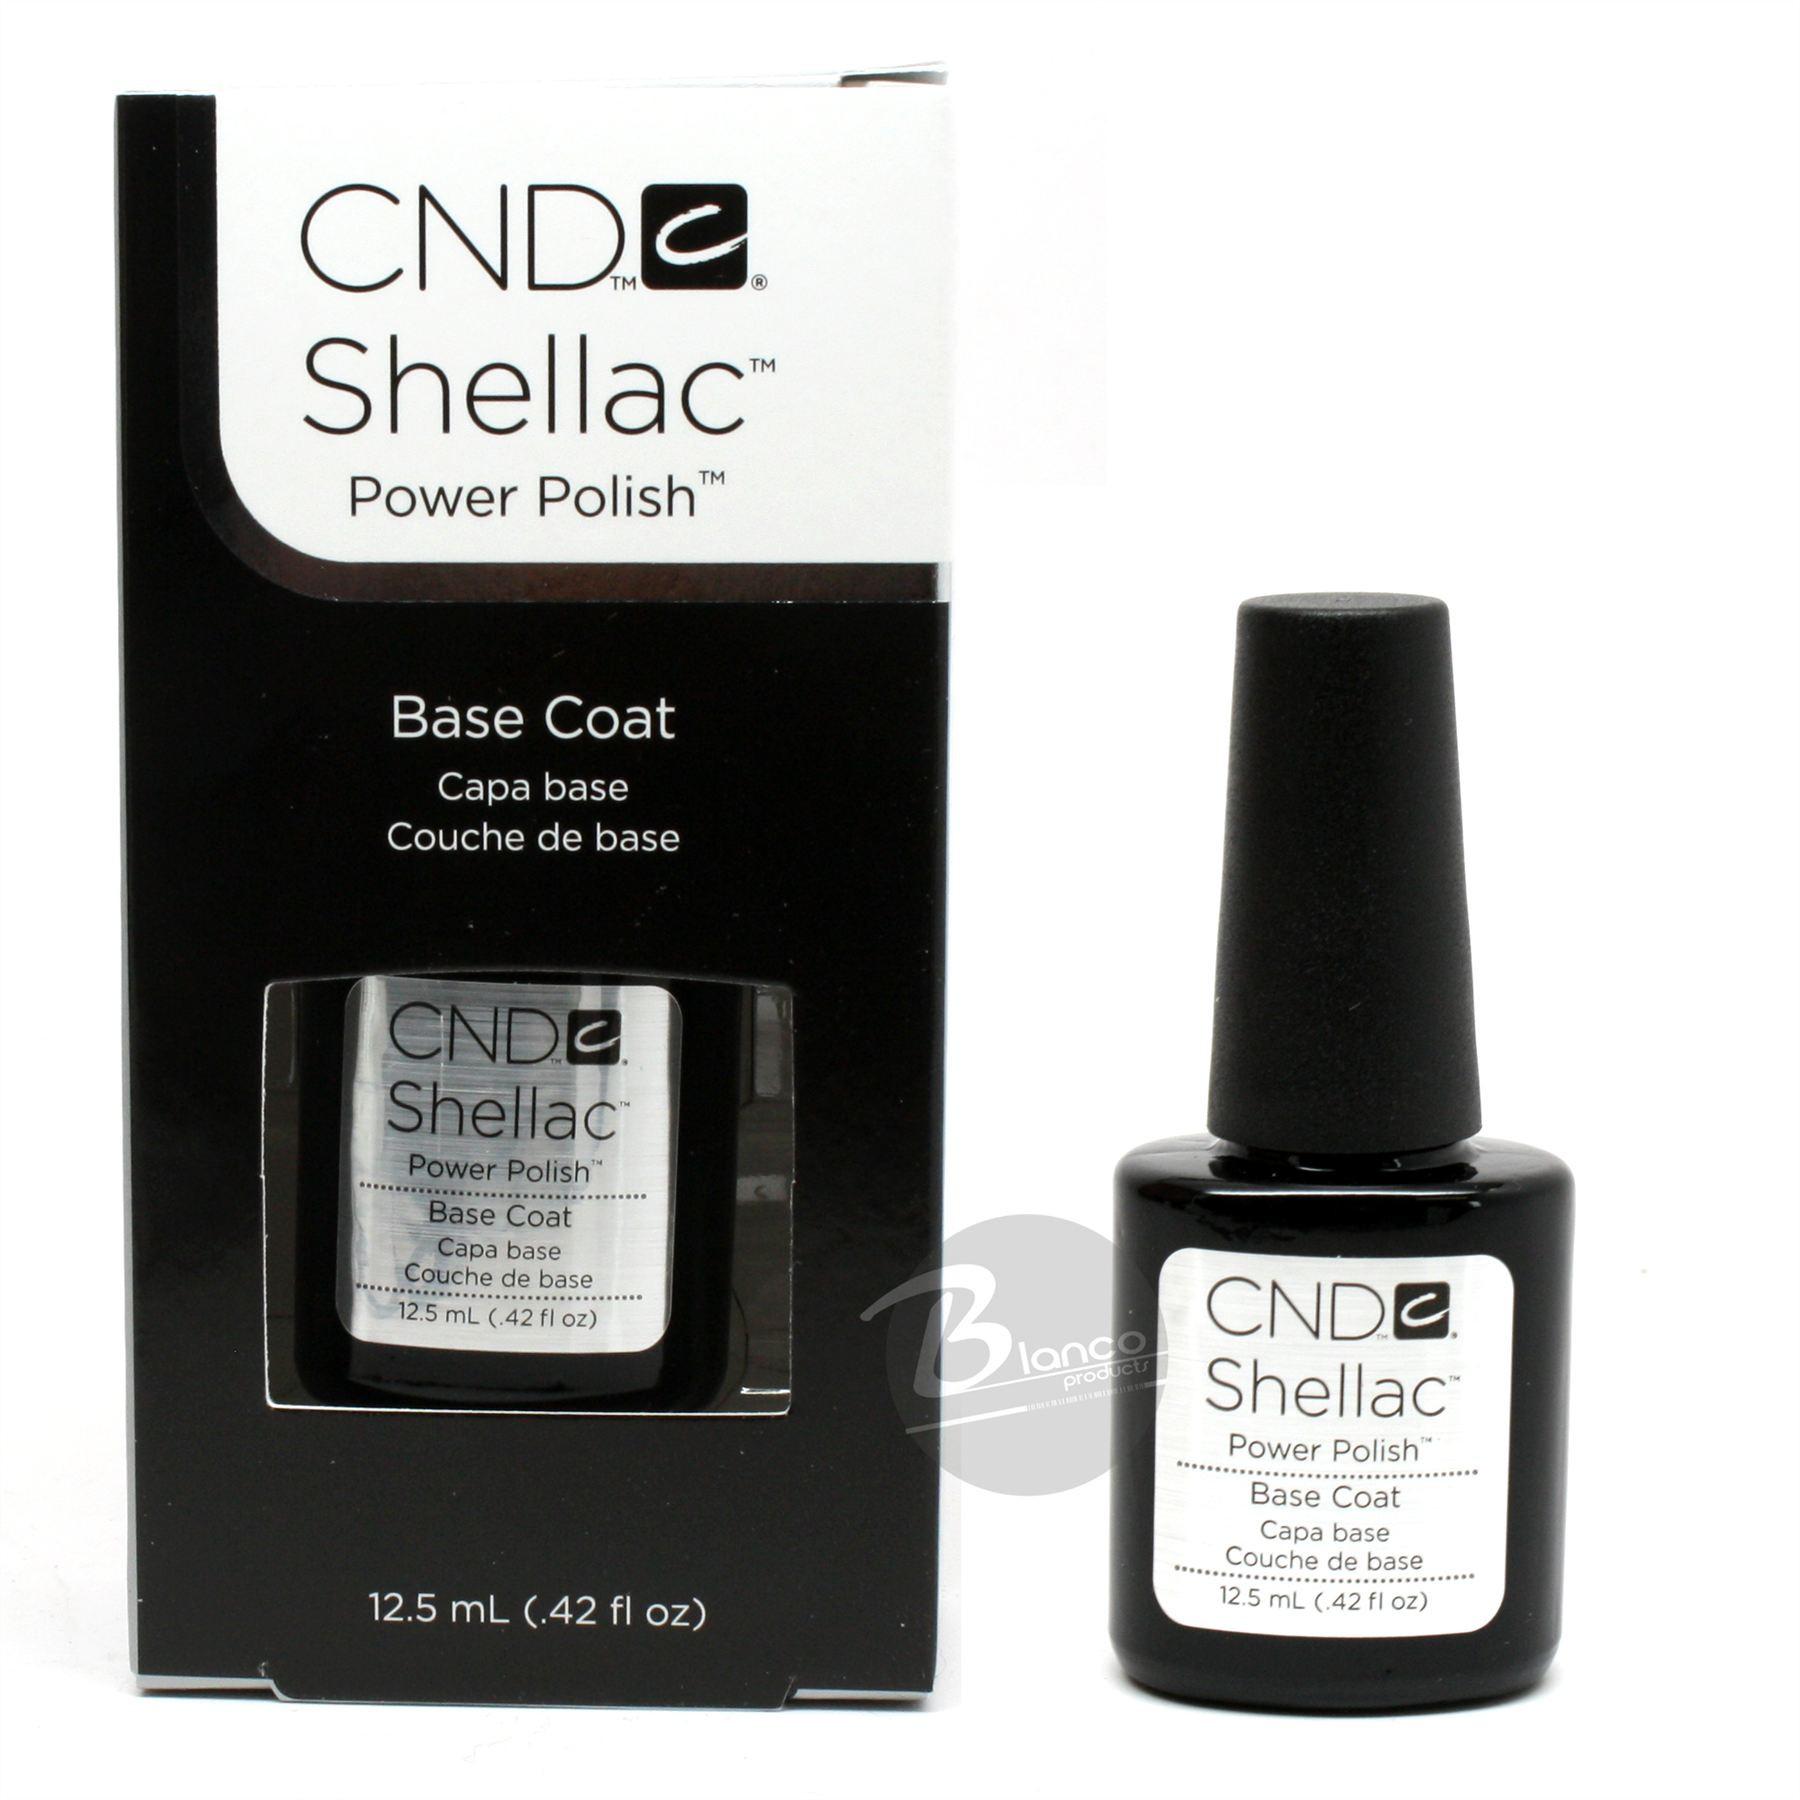 CND Shellac - 40404 - Express Base Coat / 0.5 oz. - 15 mL